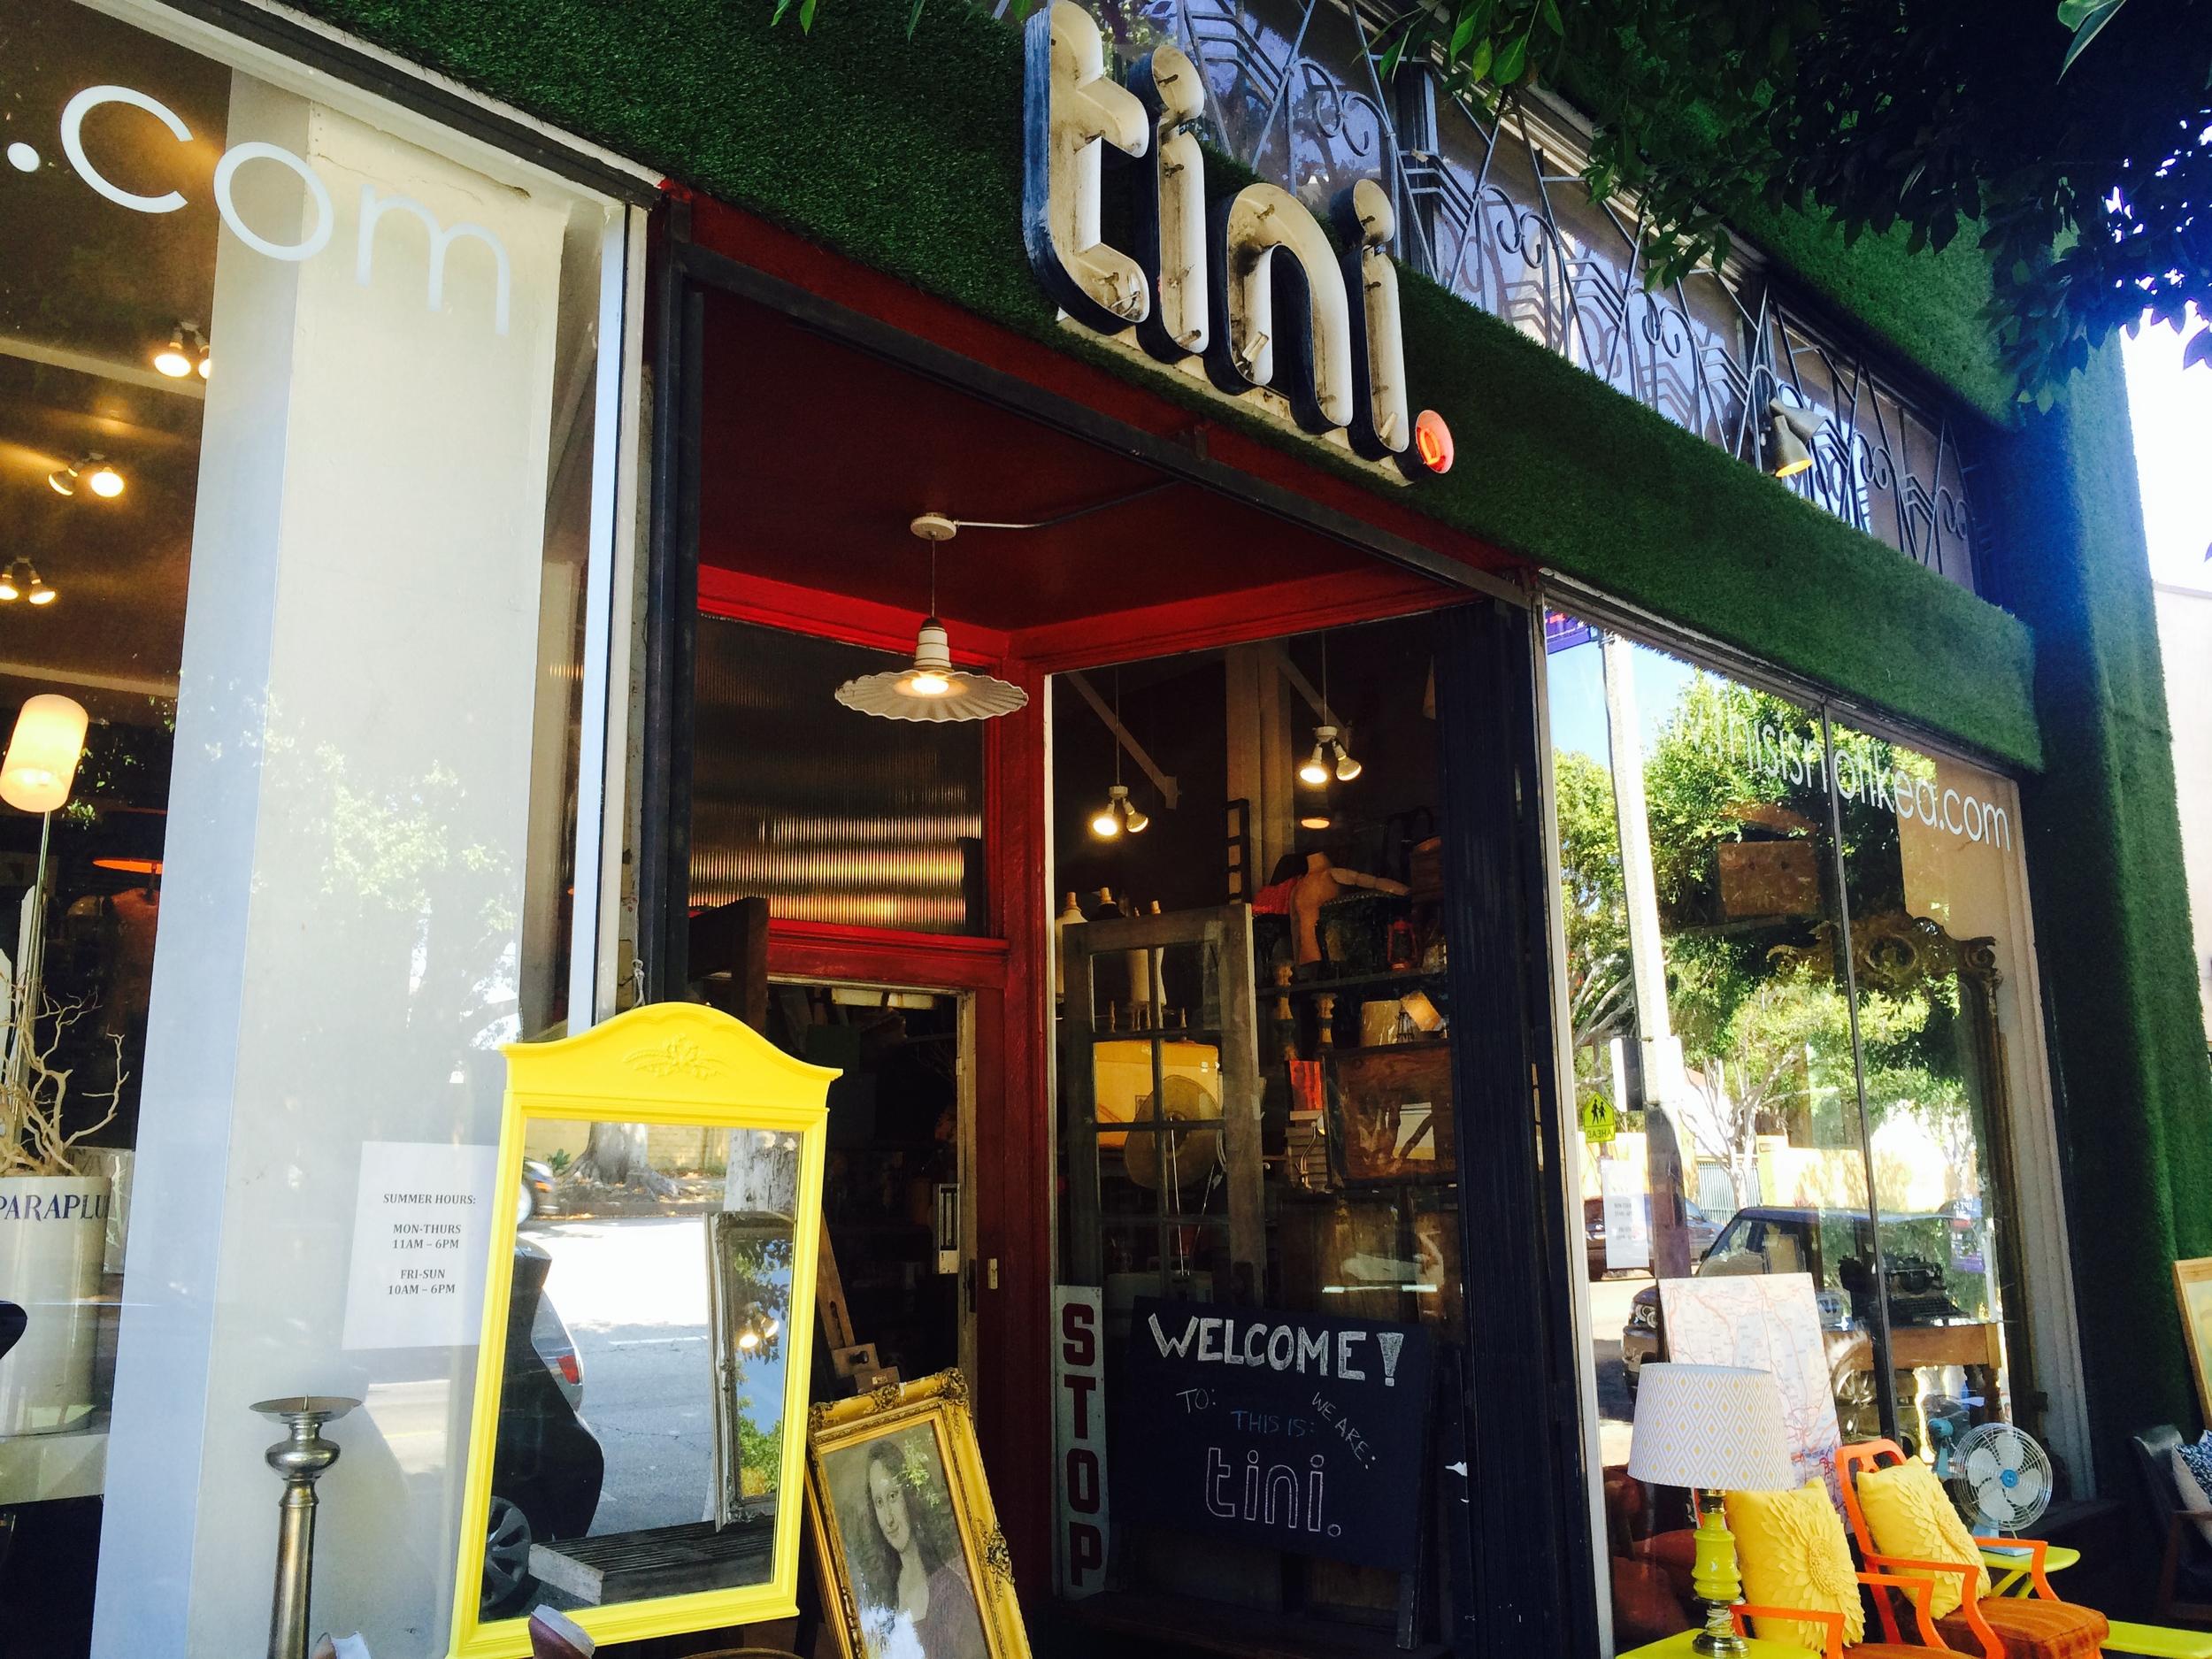 Established California | Habitat | Tini Storefront